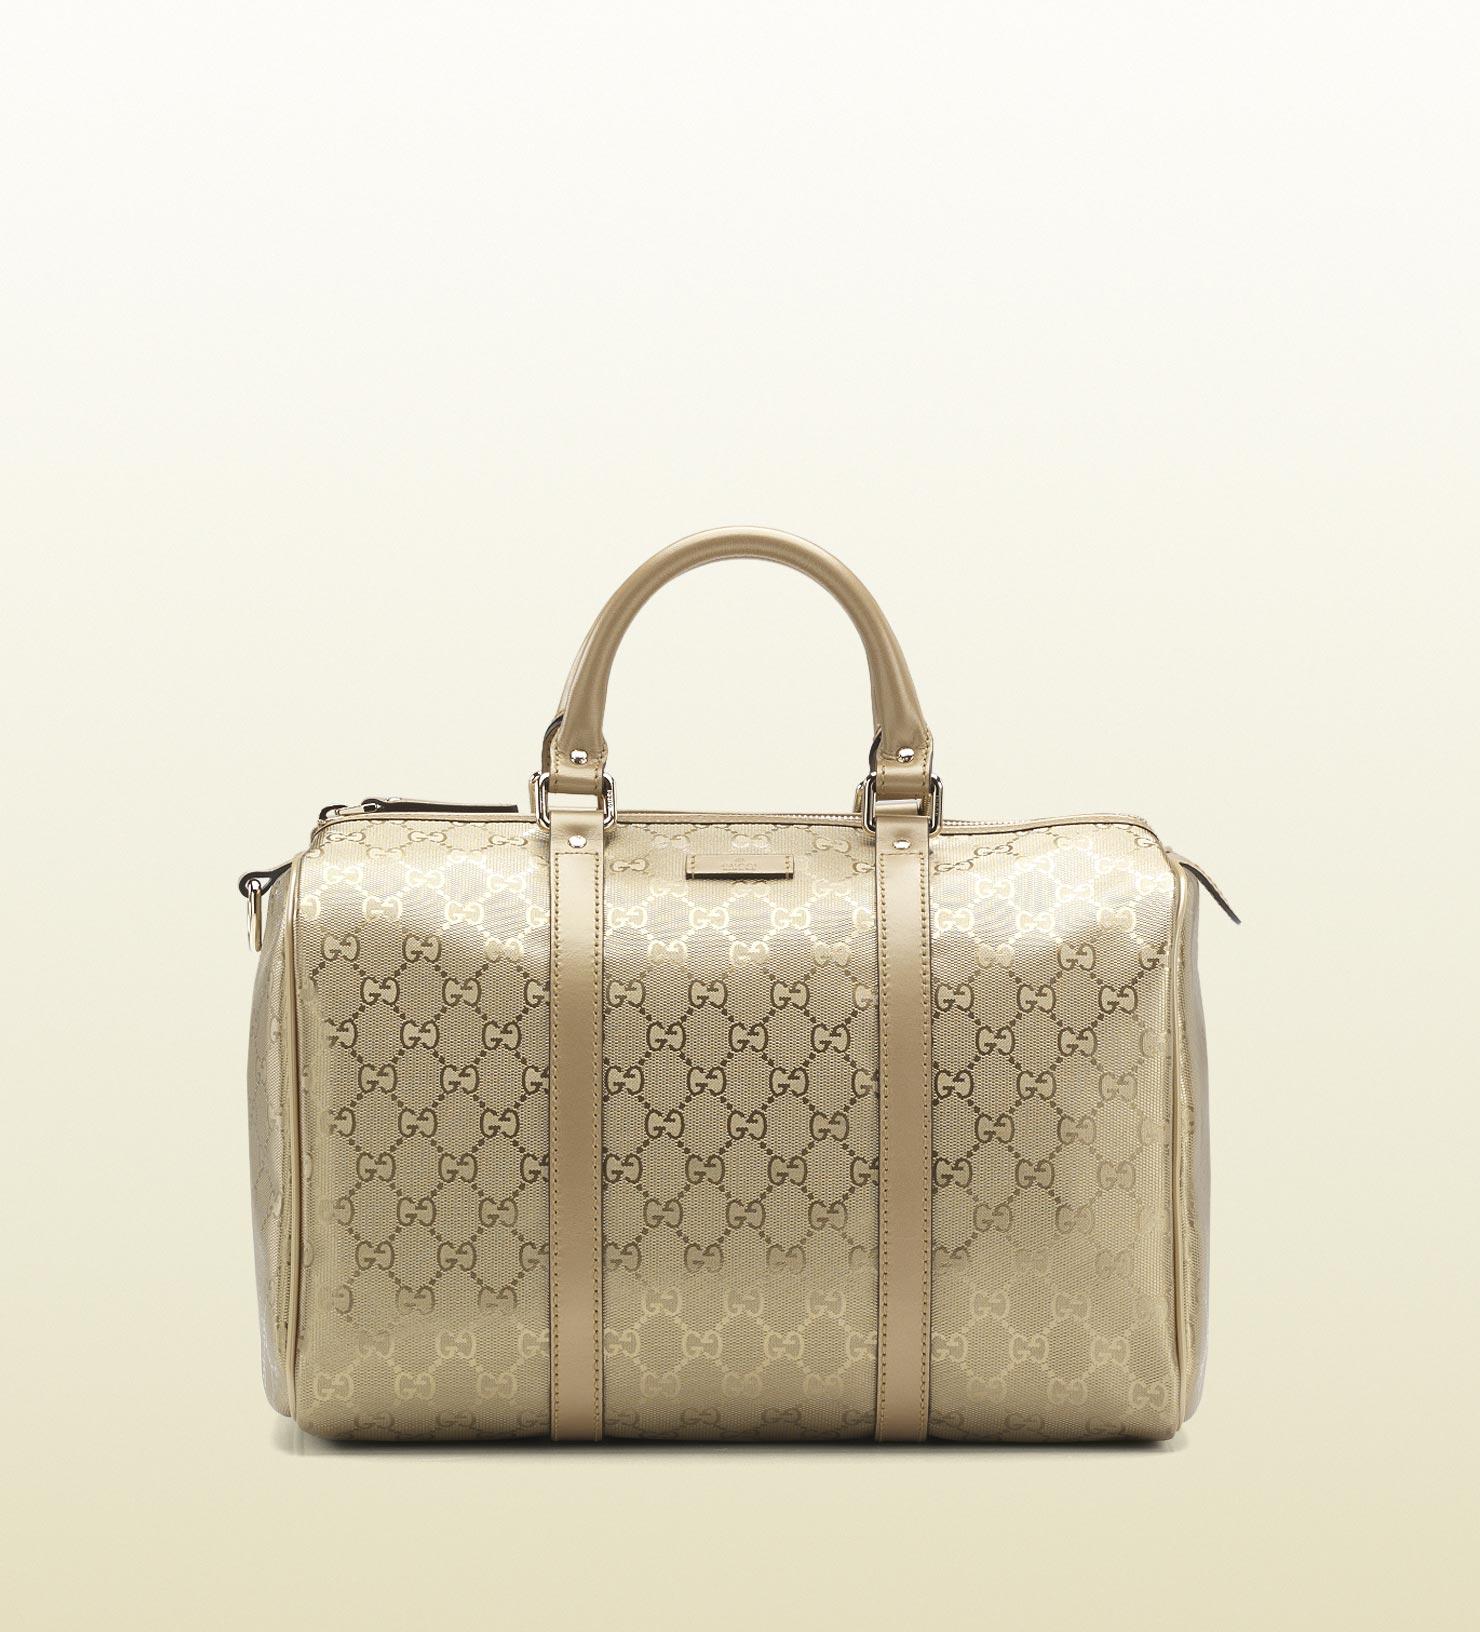 3bdccf9fb07d Gucci Joy Boston Bag in Metallic - Lyst